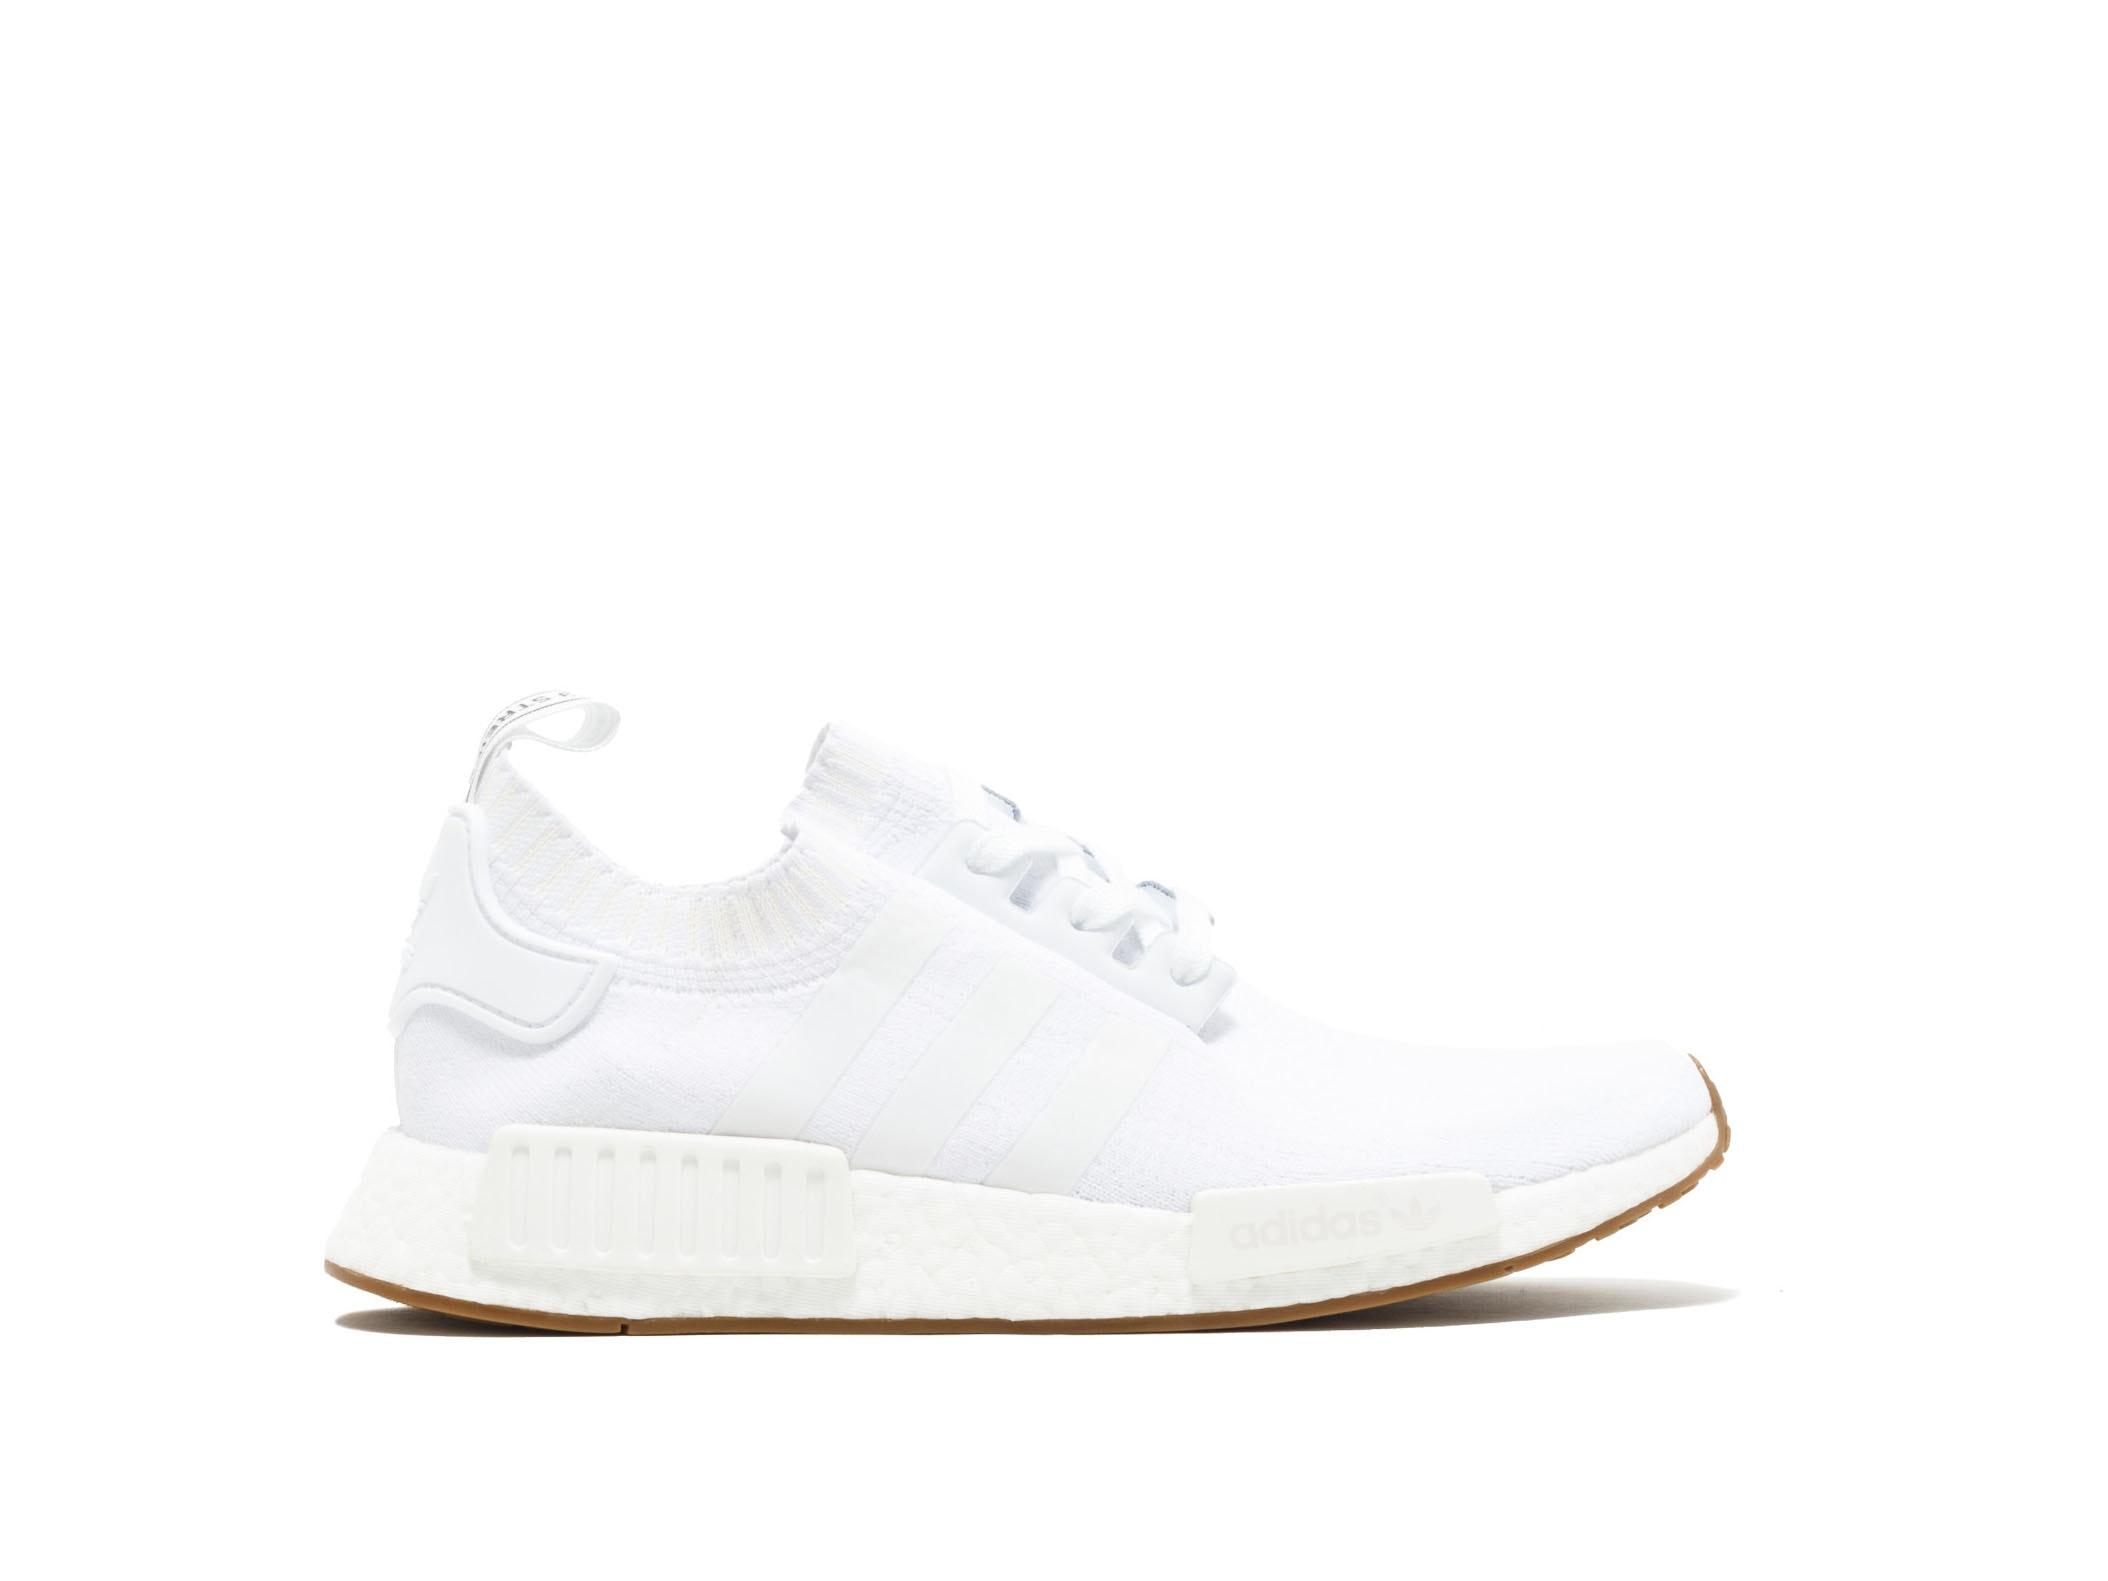 1ab9cf96e11c7 Shop White Gum Primeknit NMD R1 Online